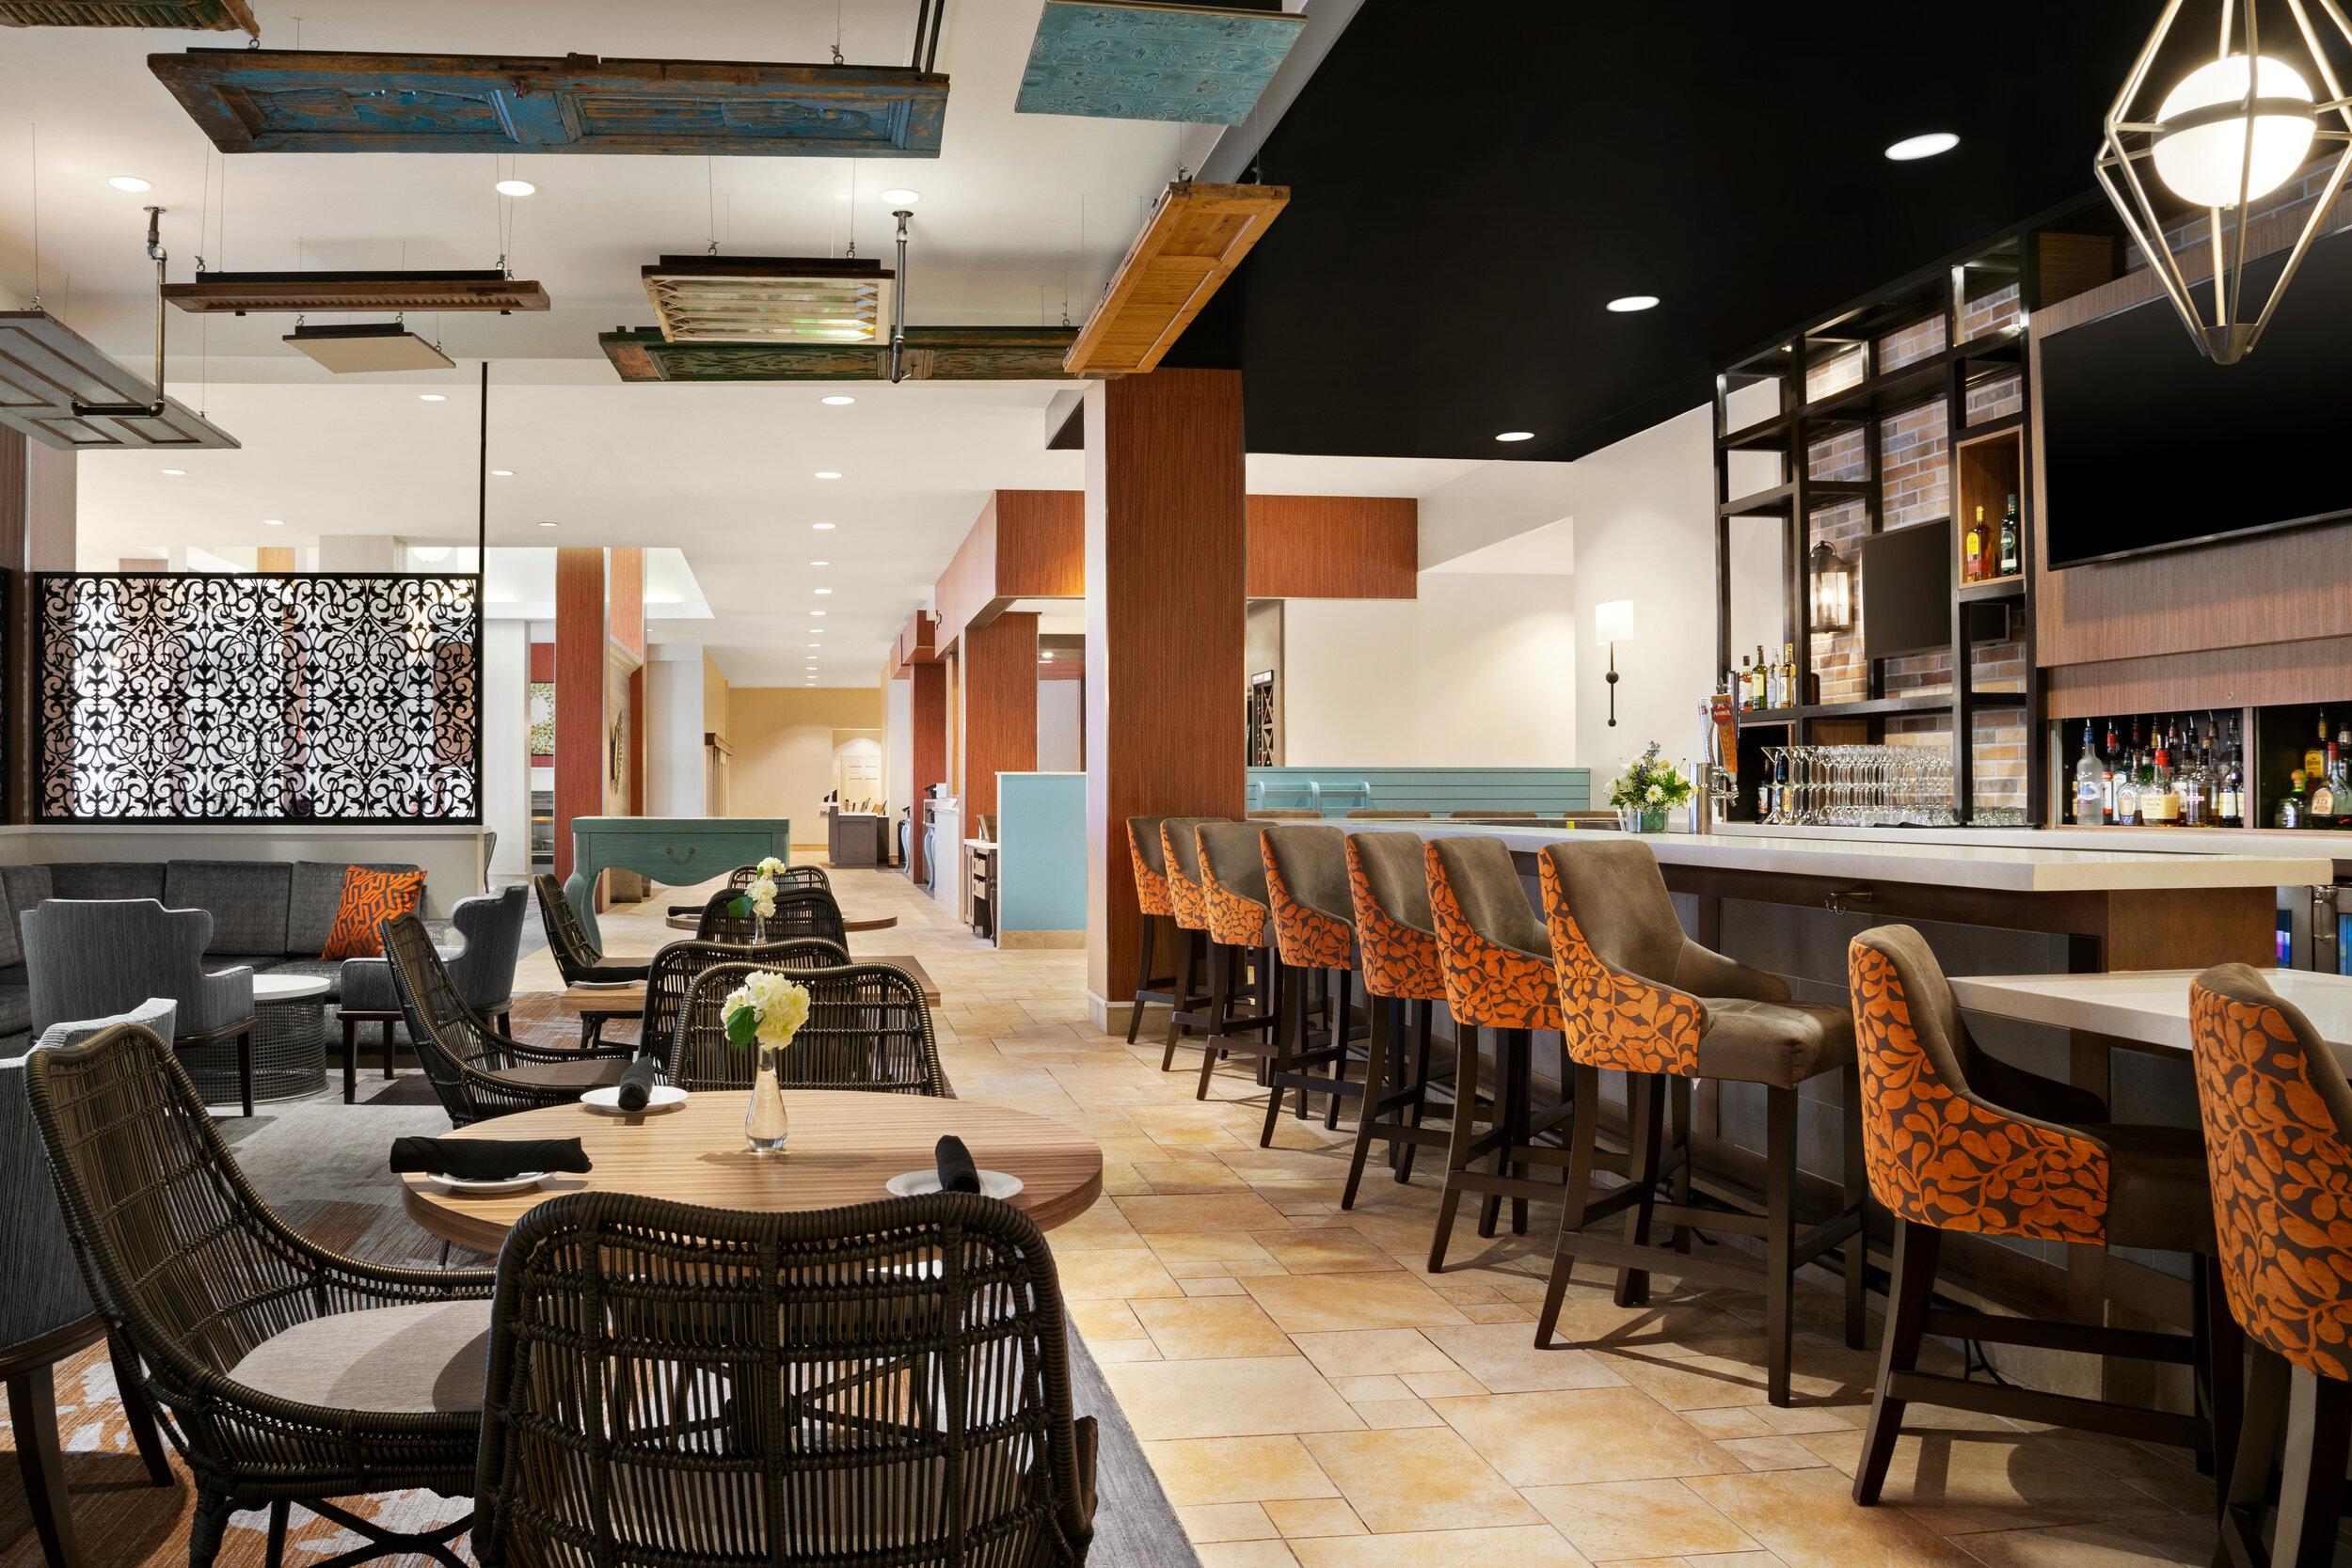 MSYGI_Restaurant_Bar_Angles_01.jpg